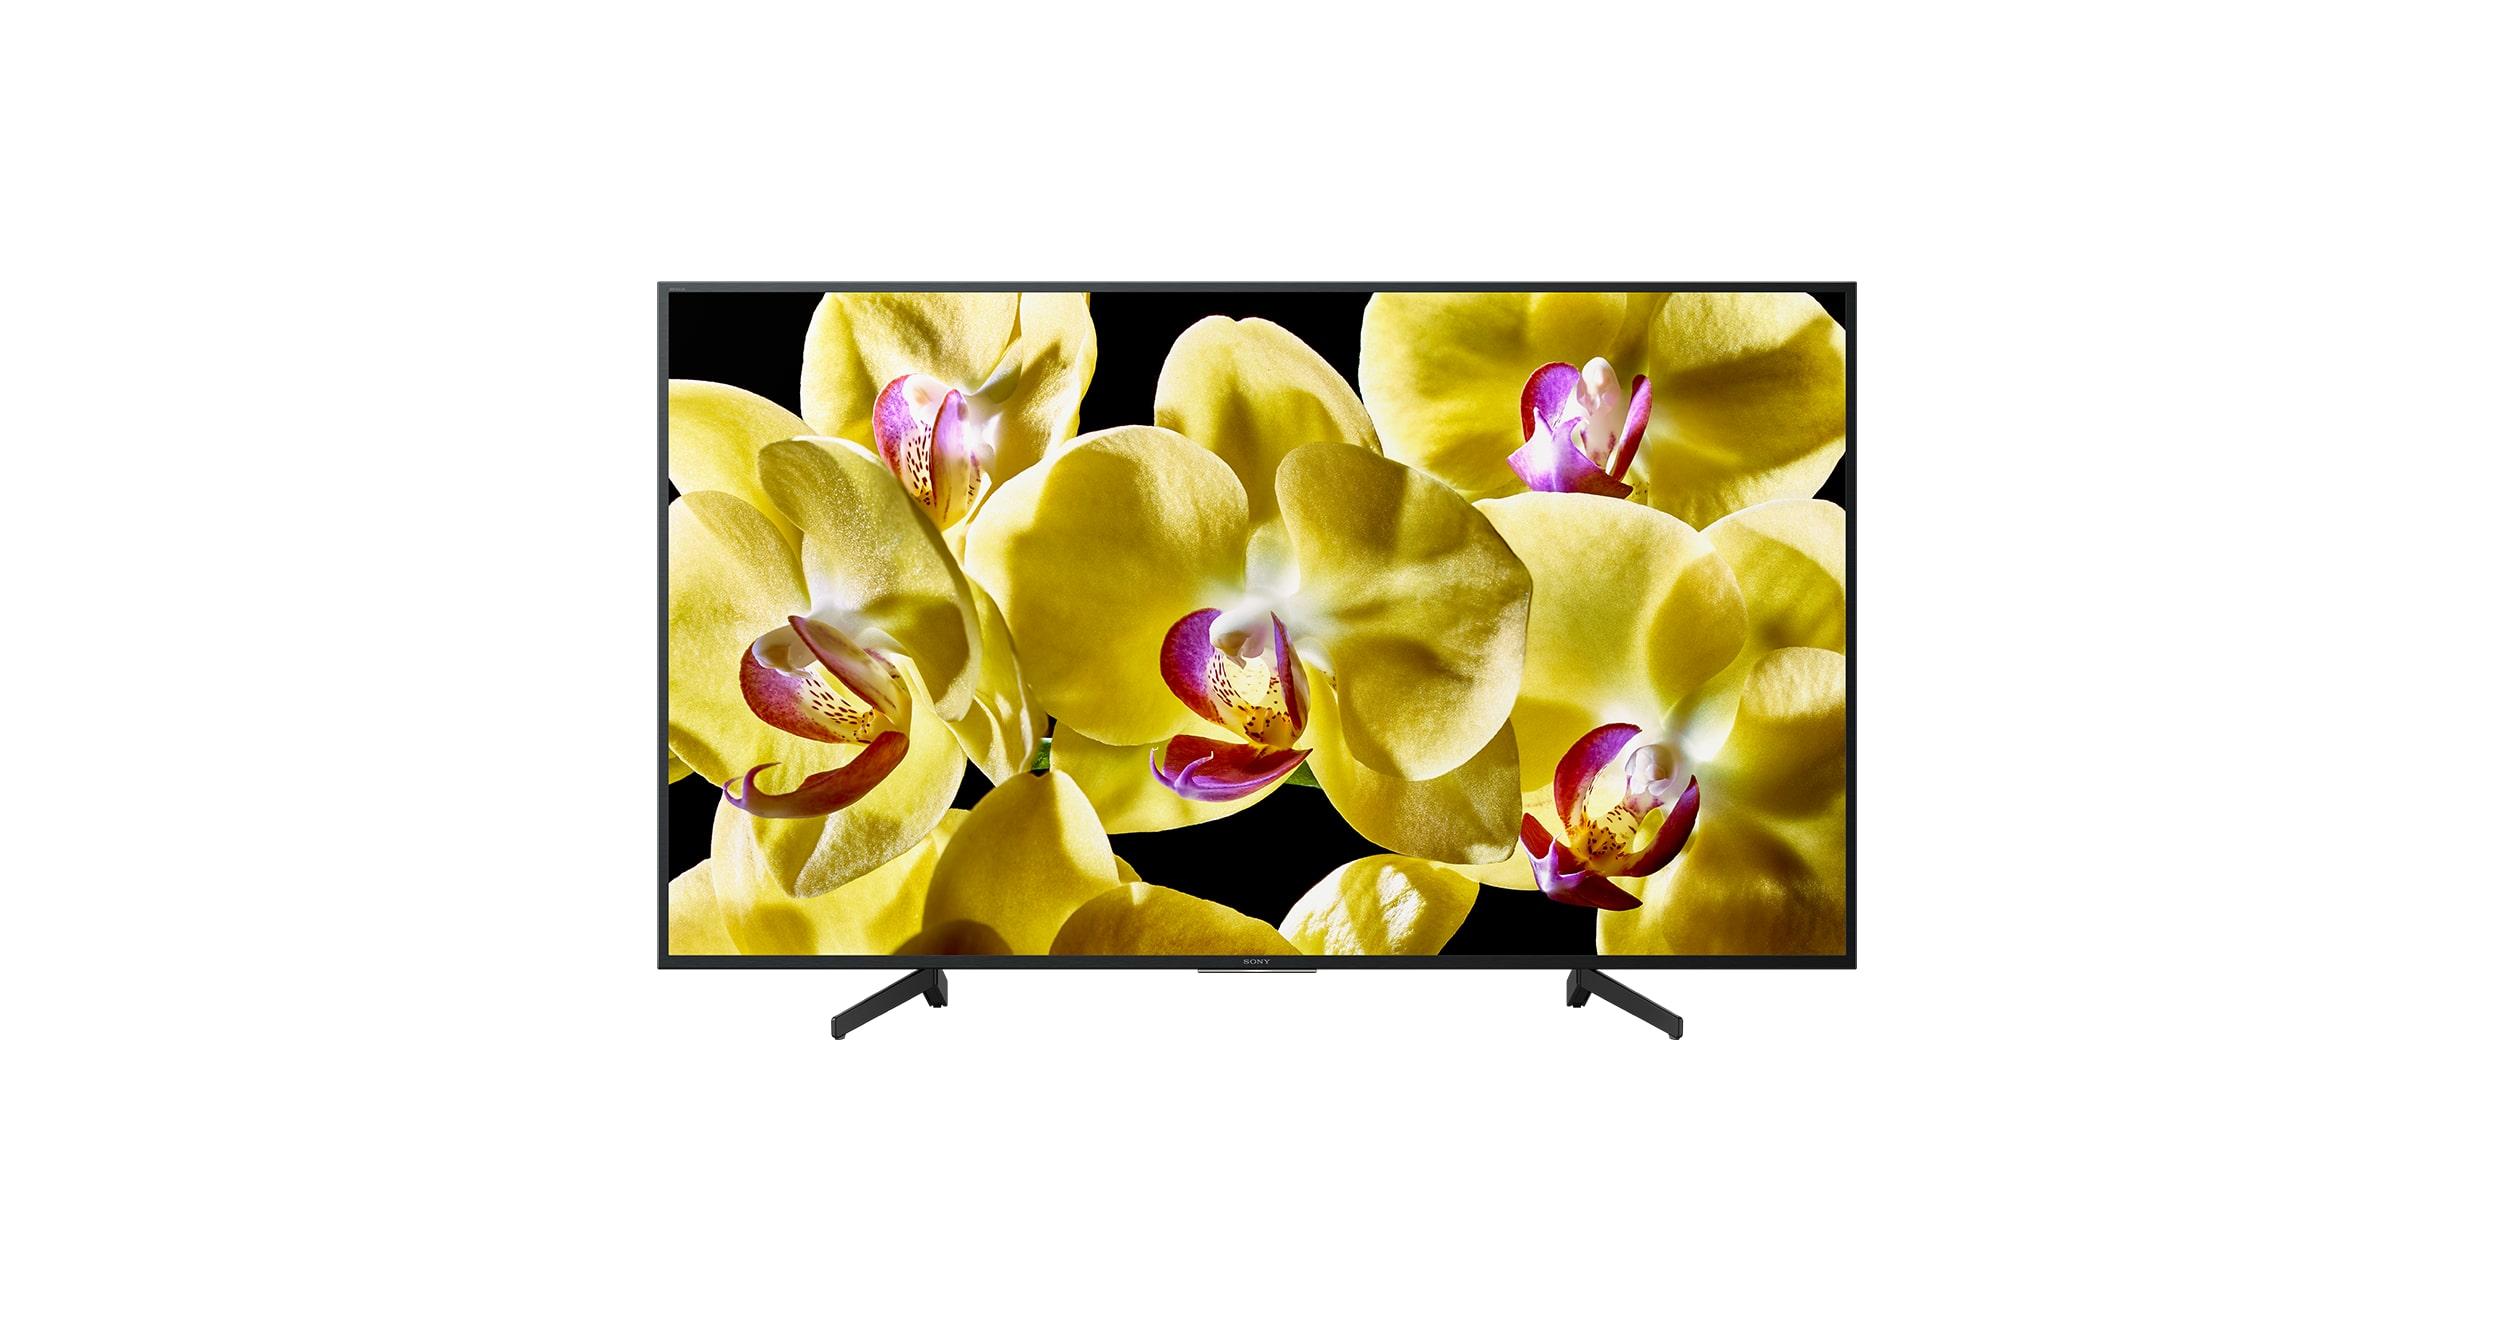 X80G Series LED 4K Ultra HD HDR Smart TV | Sony US